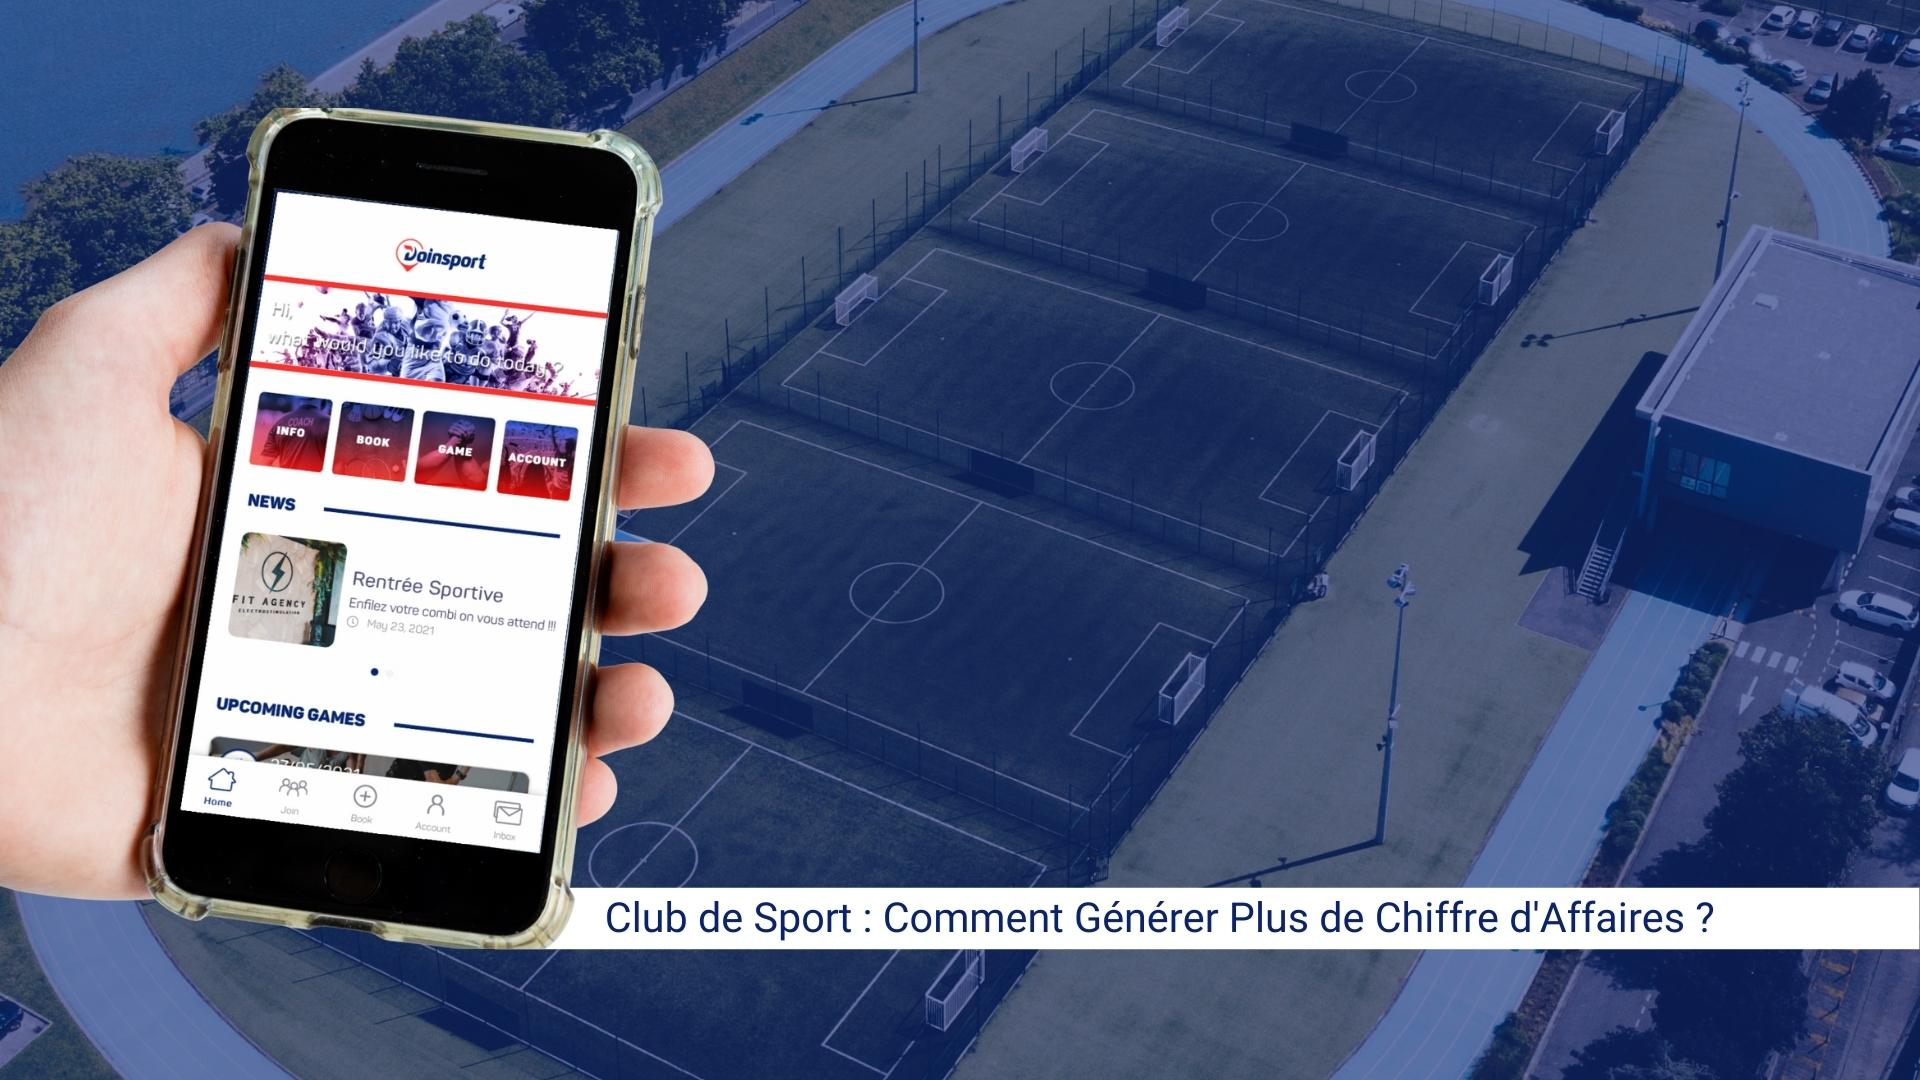 Doinsport_Logiciel_de_Gestion_Club_de_Sport